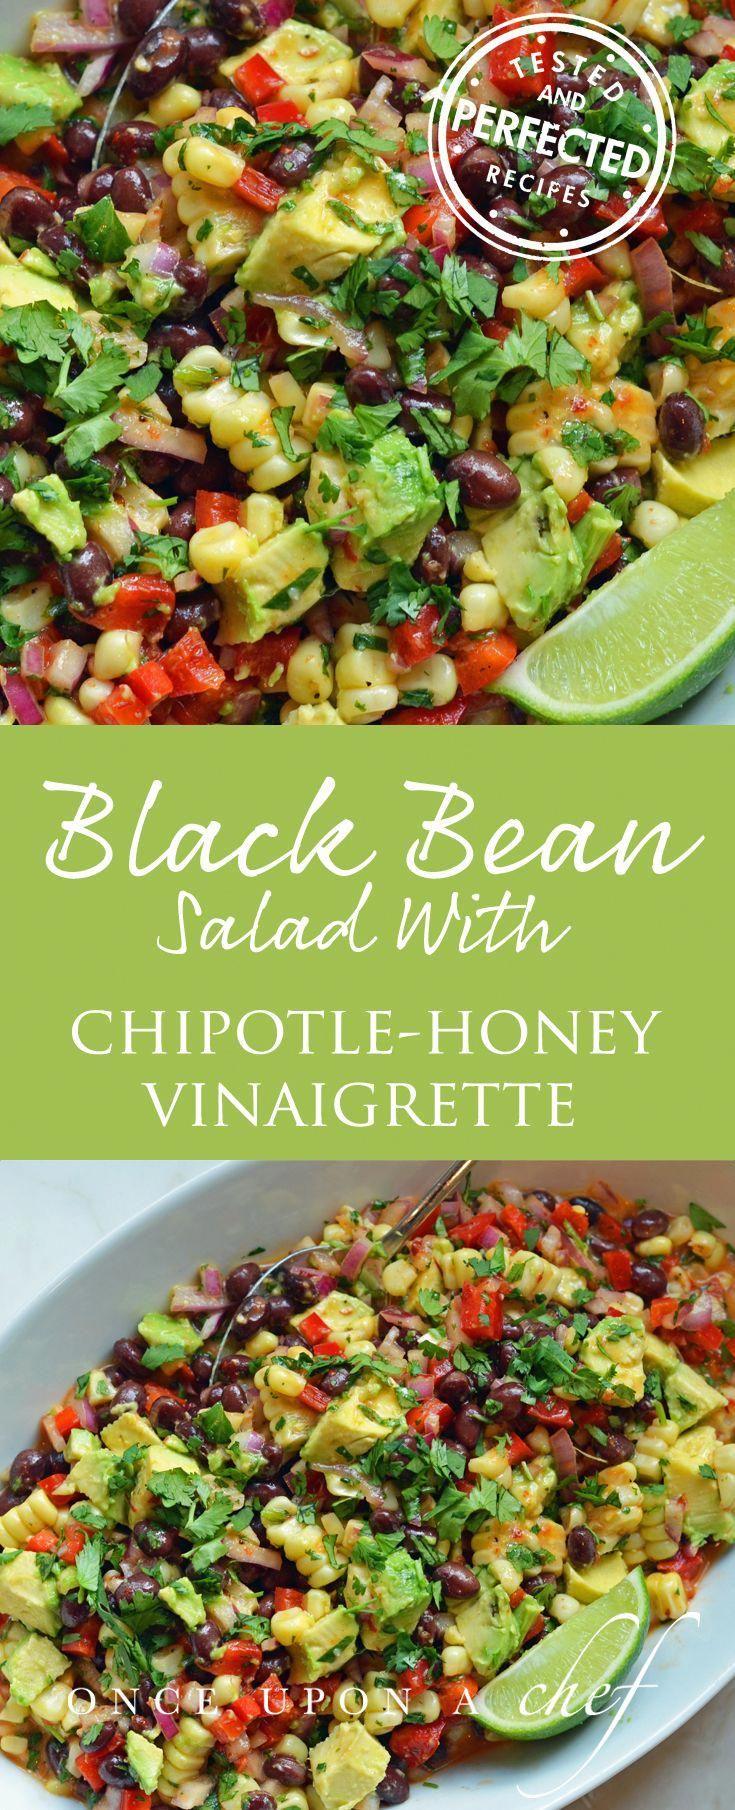 Black bean corn salad with chipotlehoney vinaigrette